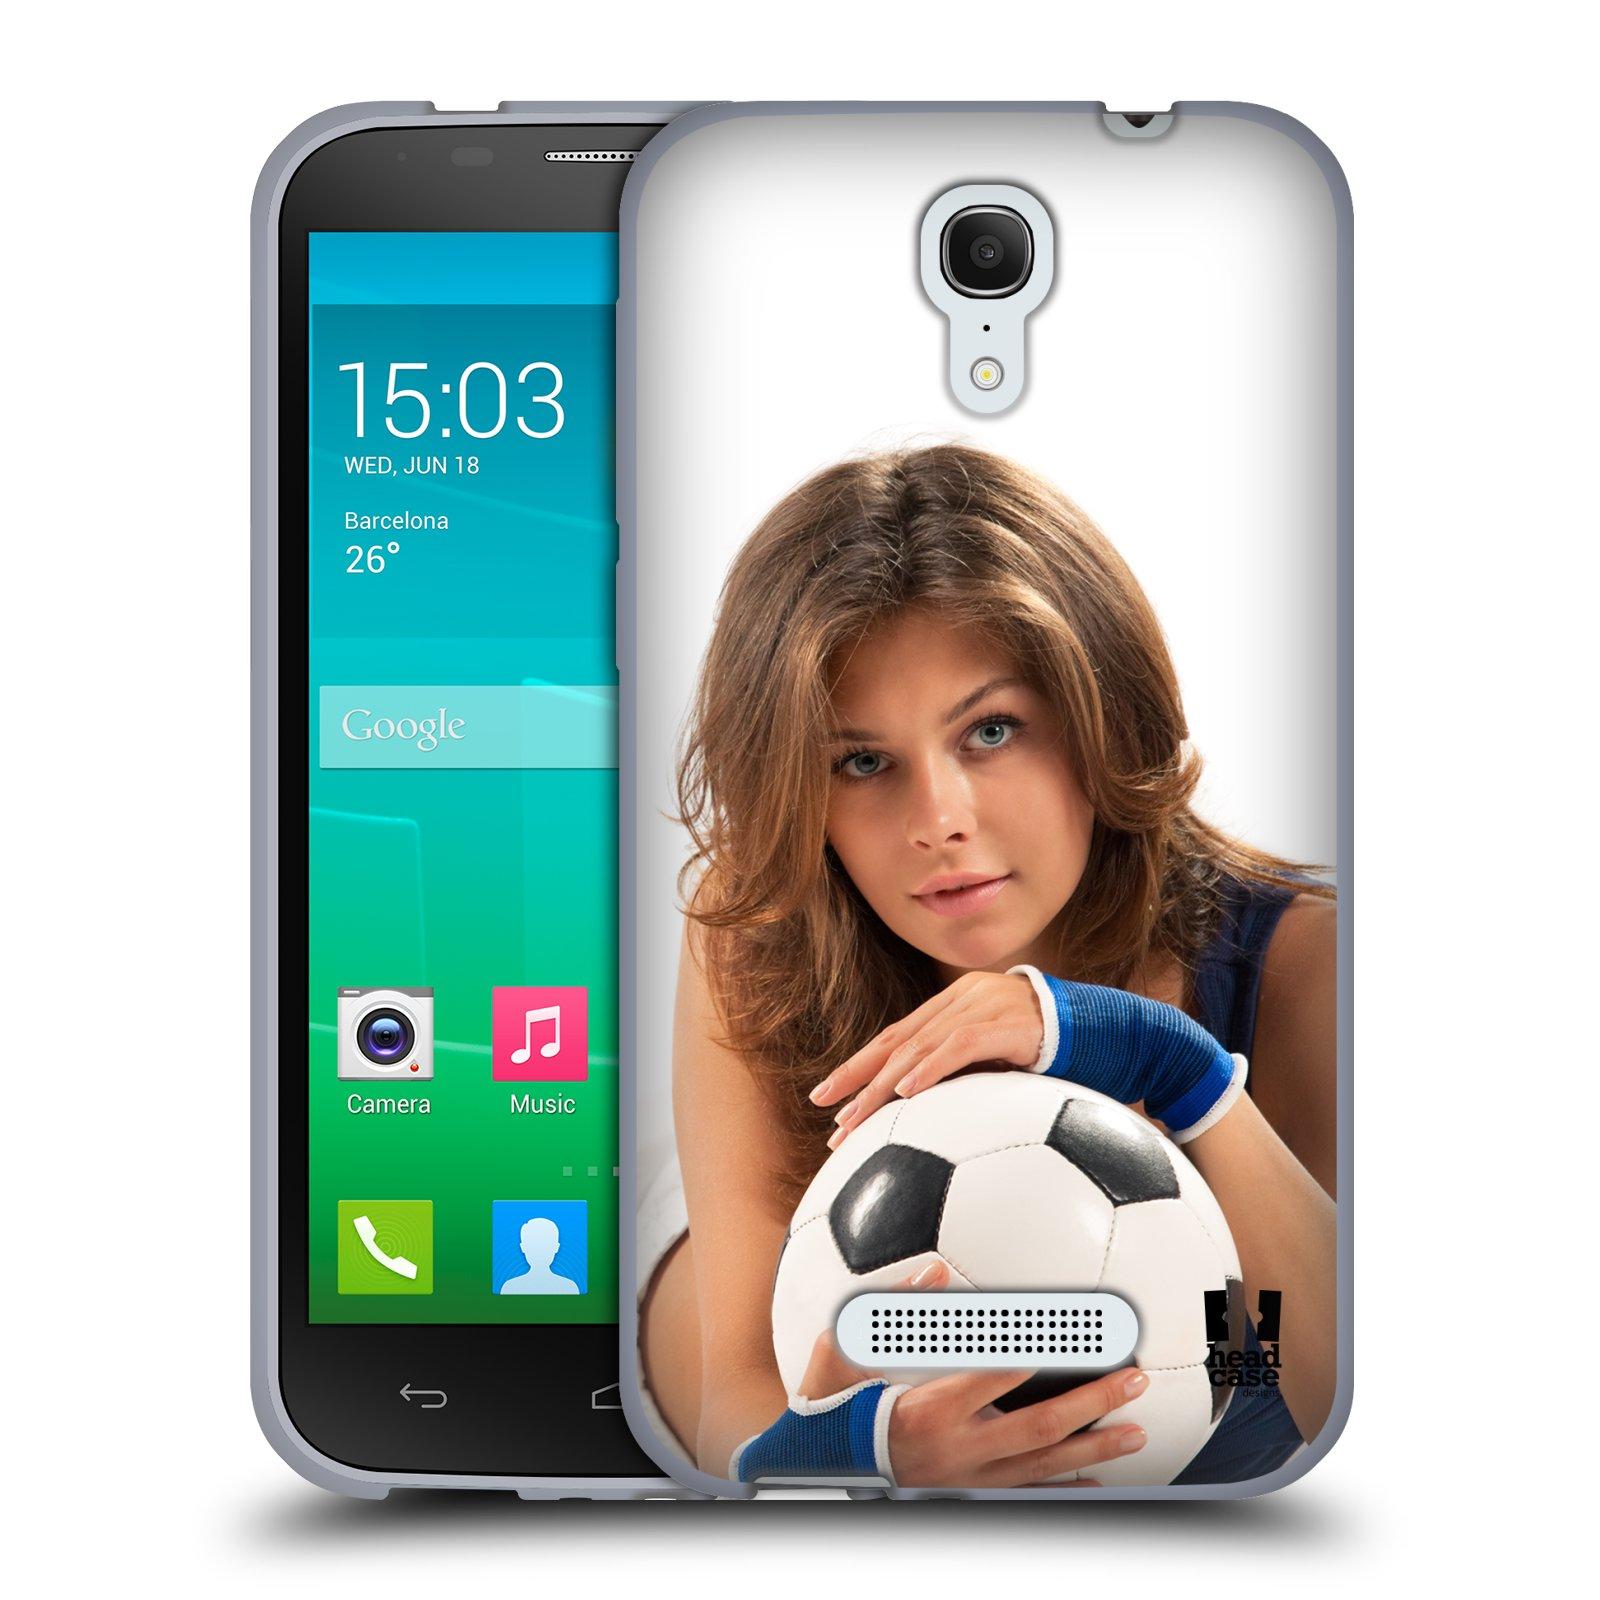 HEAD CASE silikonový obal na mobil Alcatel POP S7 vzor Fotbalové modelky POHLED